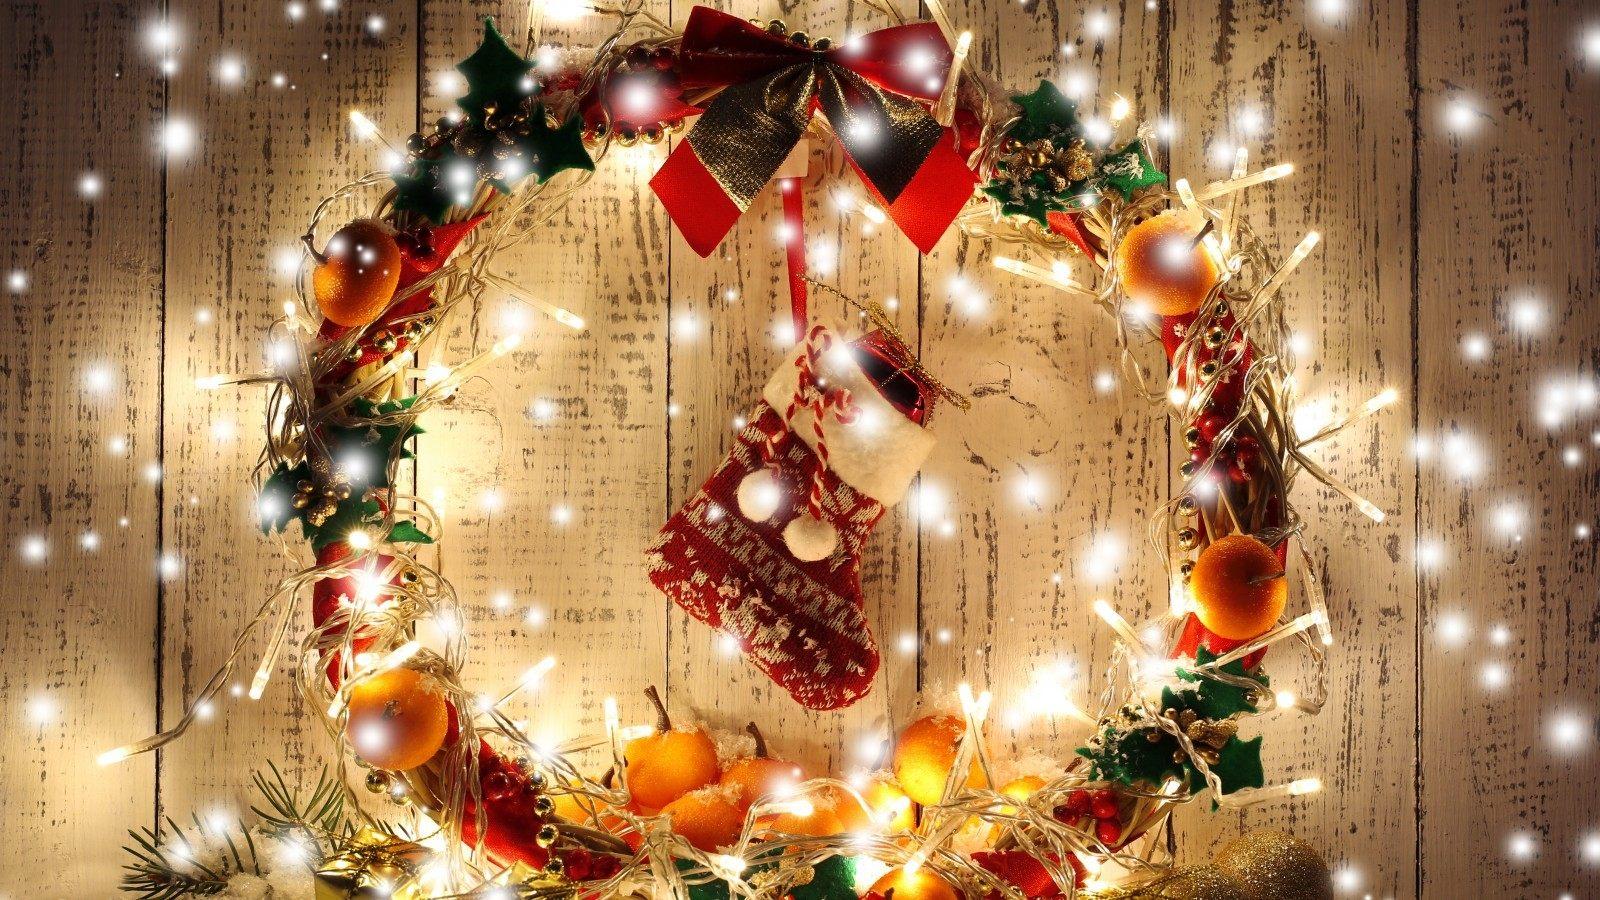 Картинки На Рабочий Стол Новогодние Елки Романтика